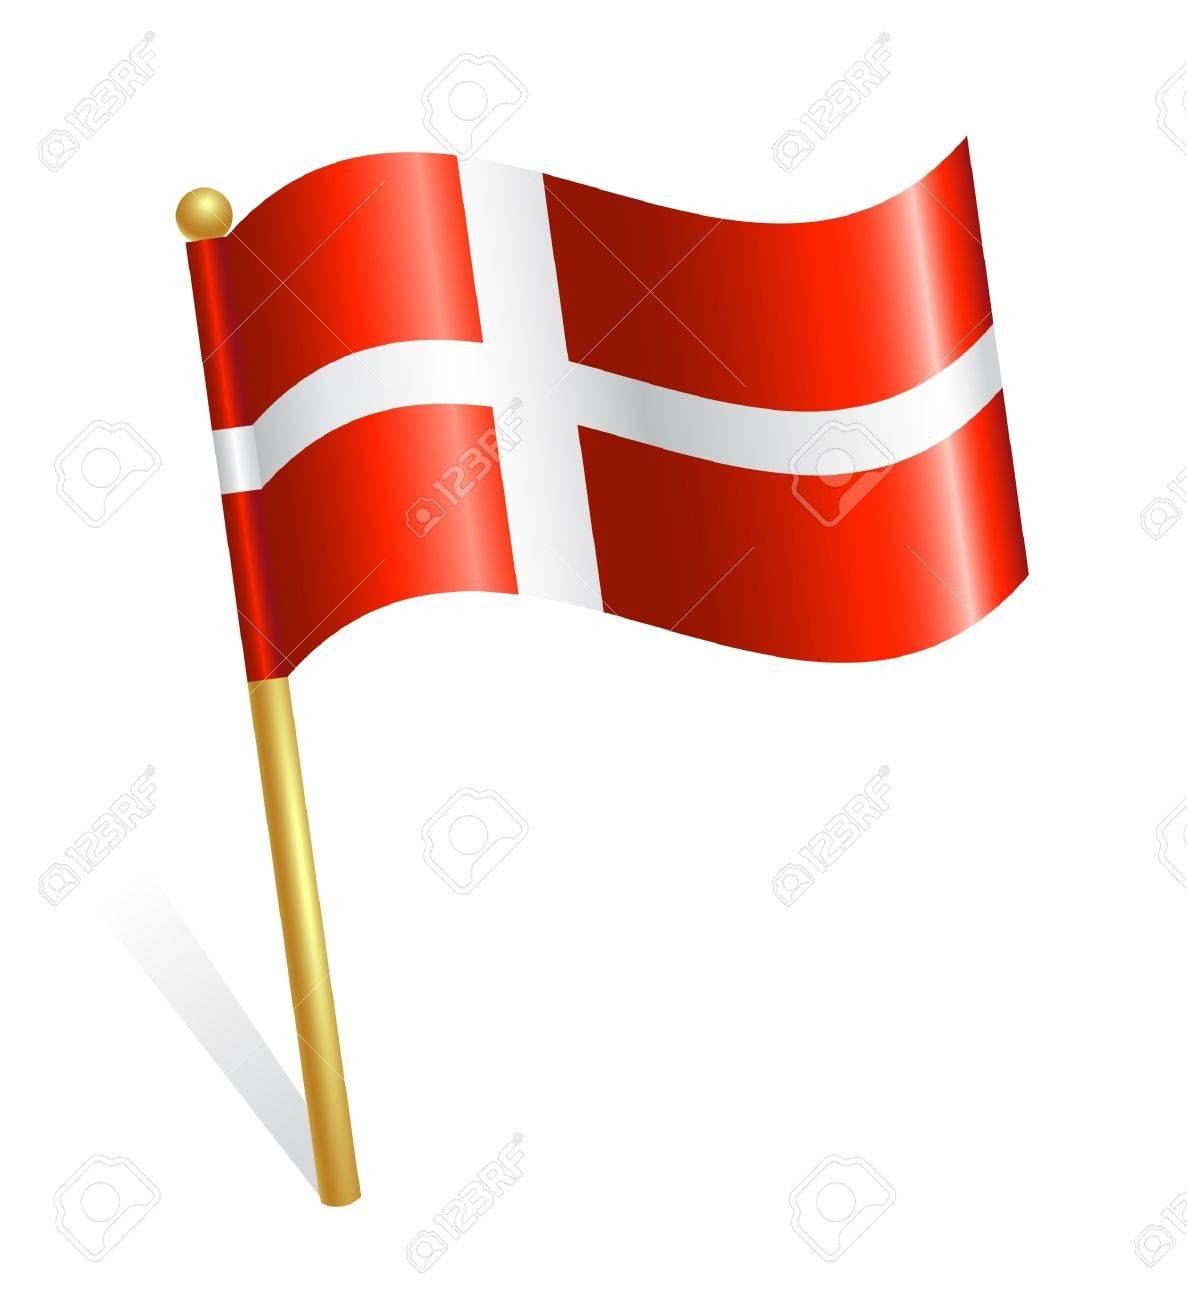 Danmark Country flag.